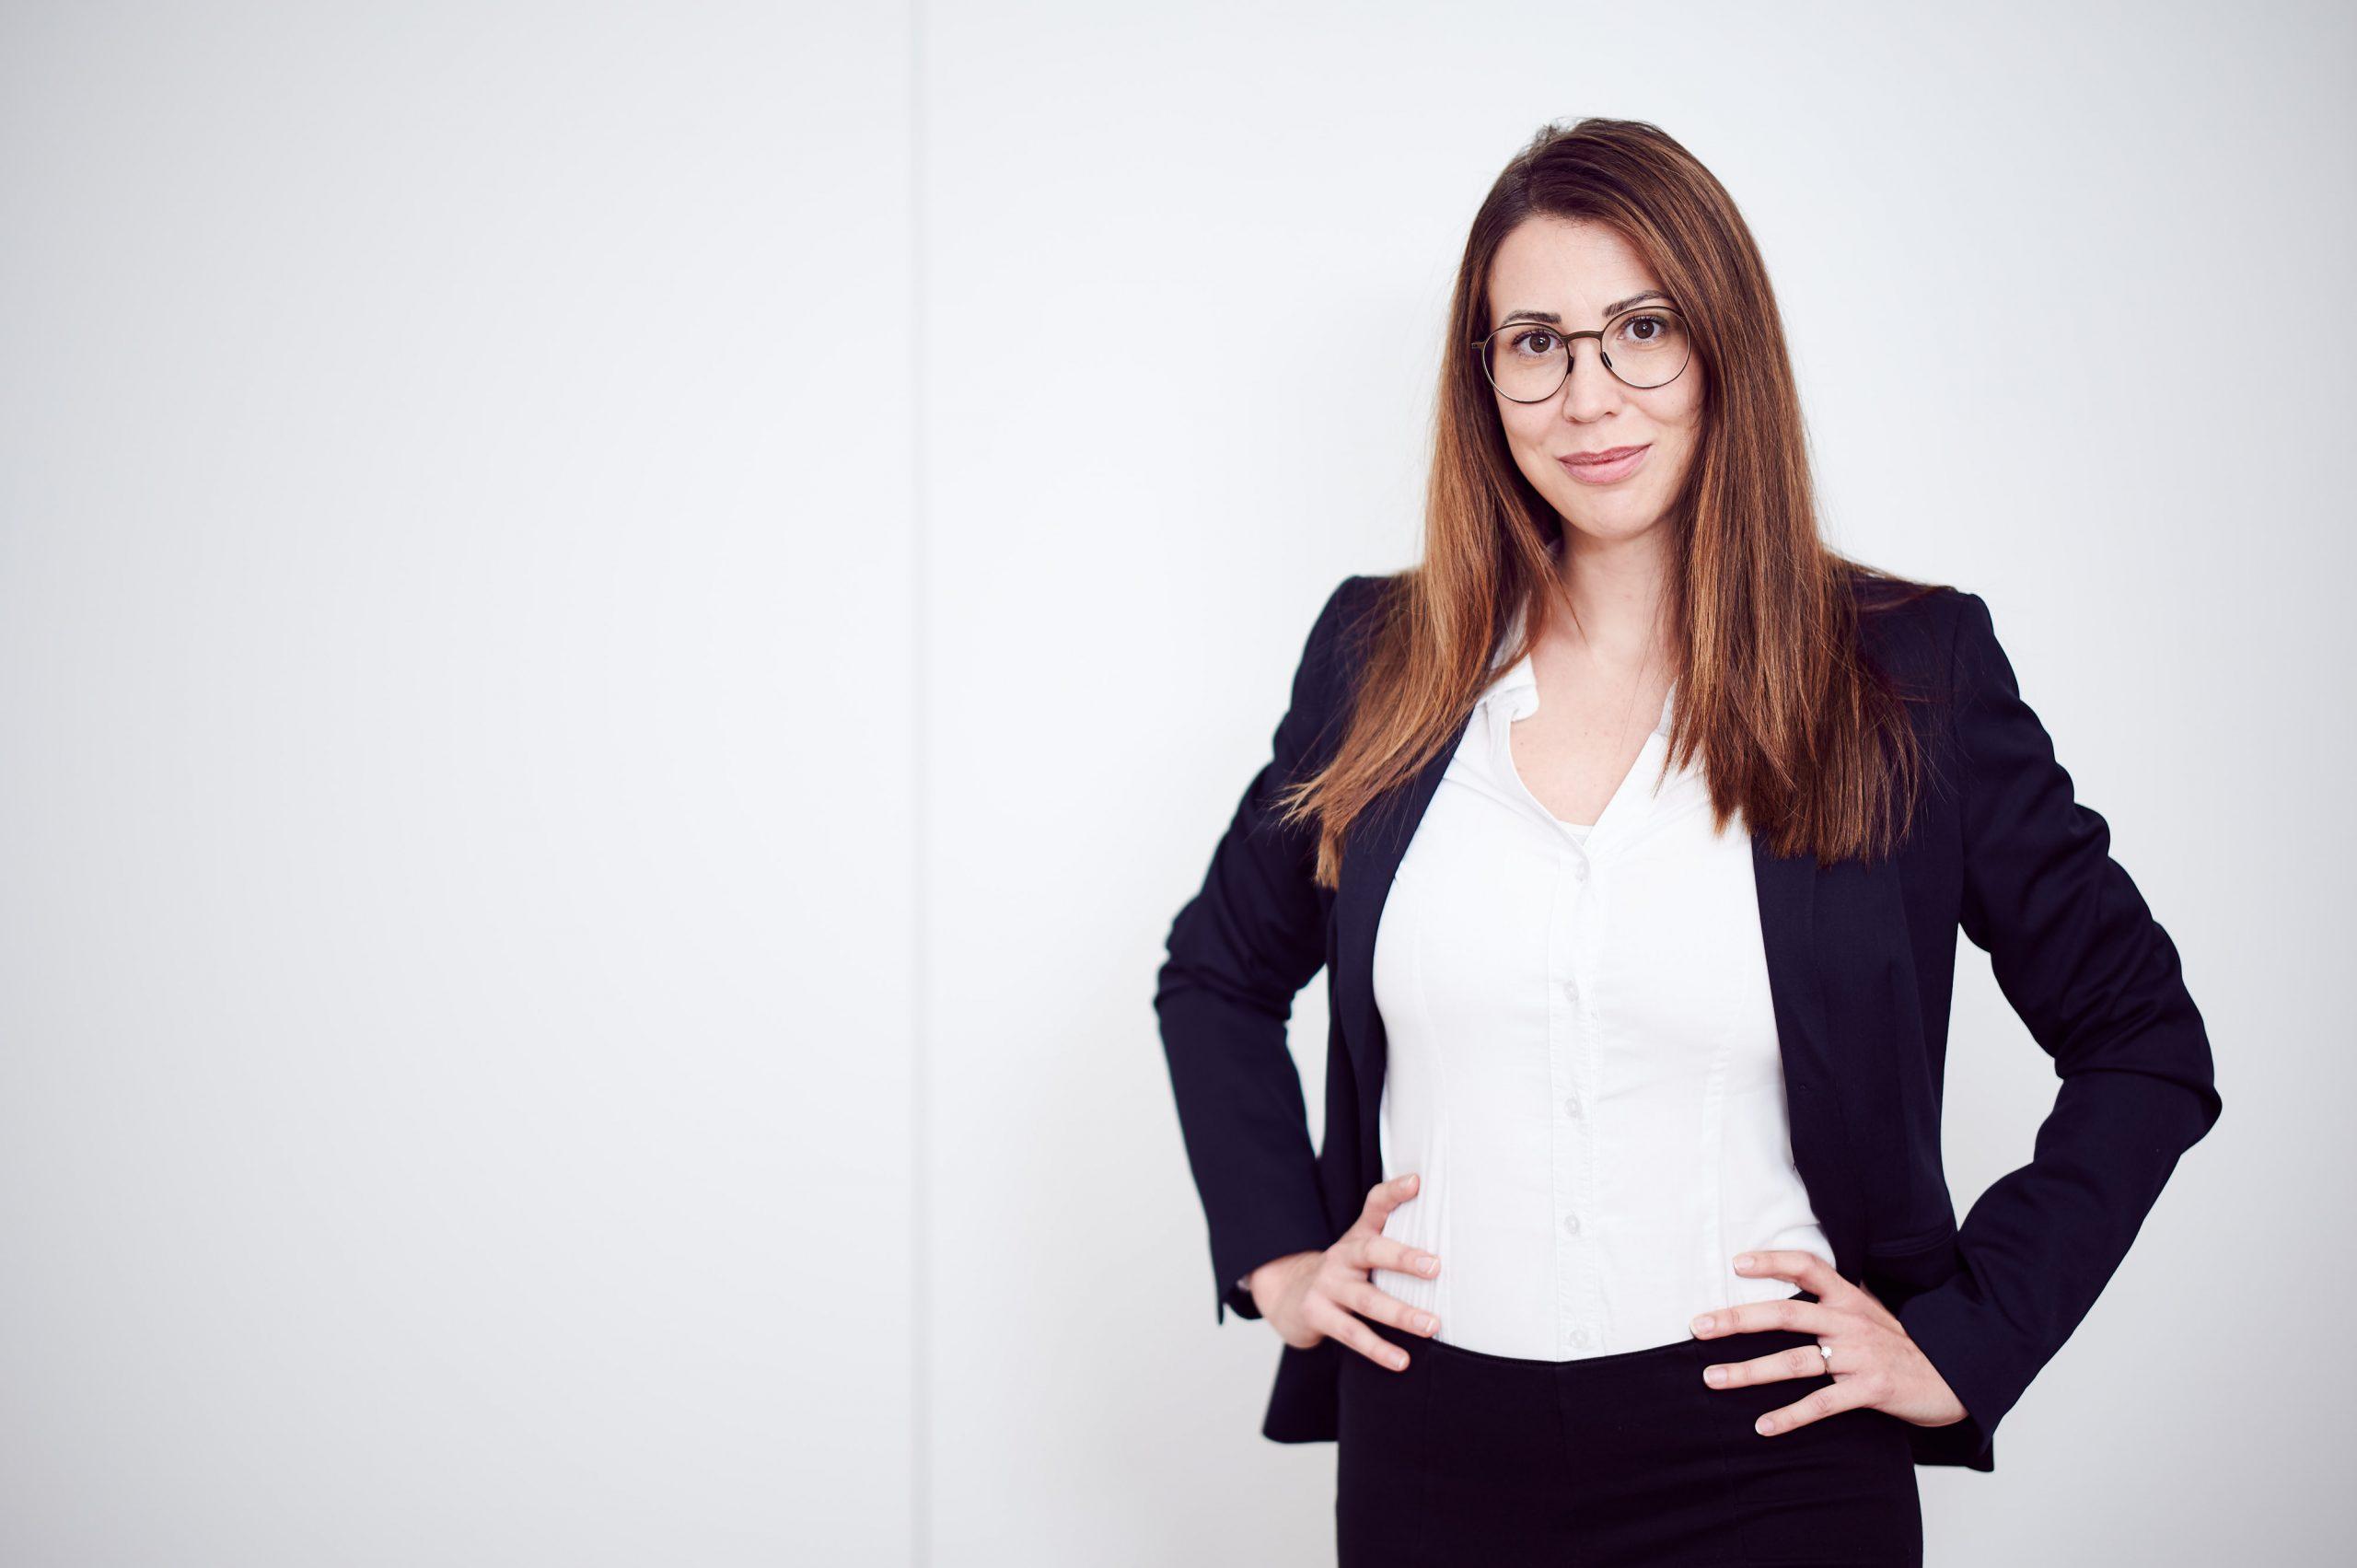 Verena Meschnig, LL.B. (WU)